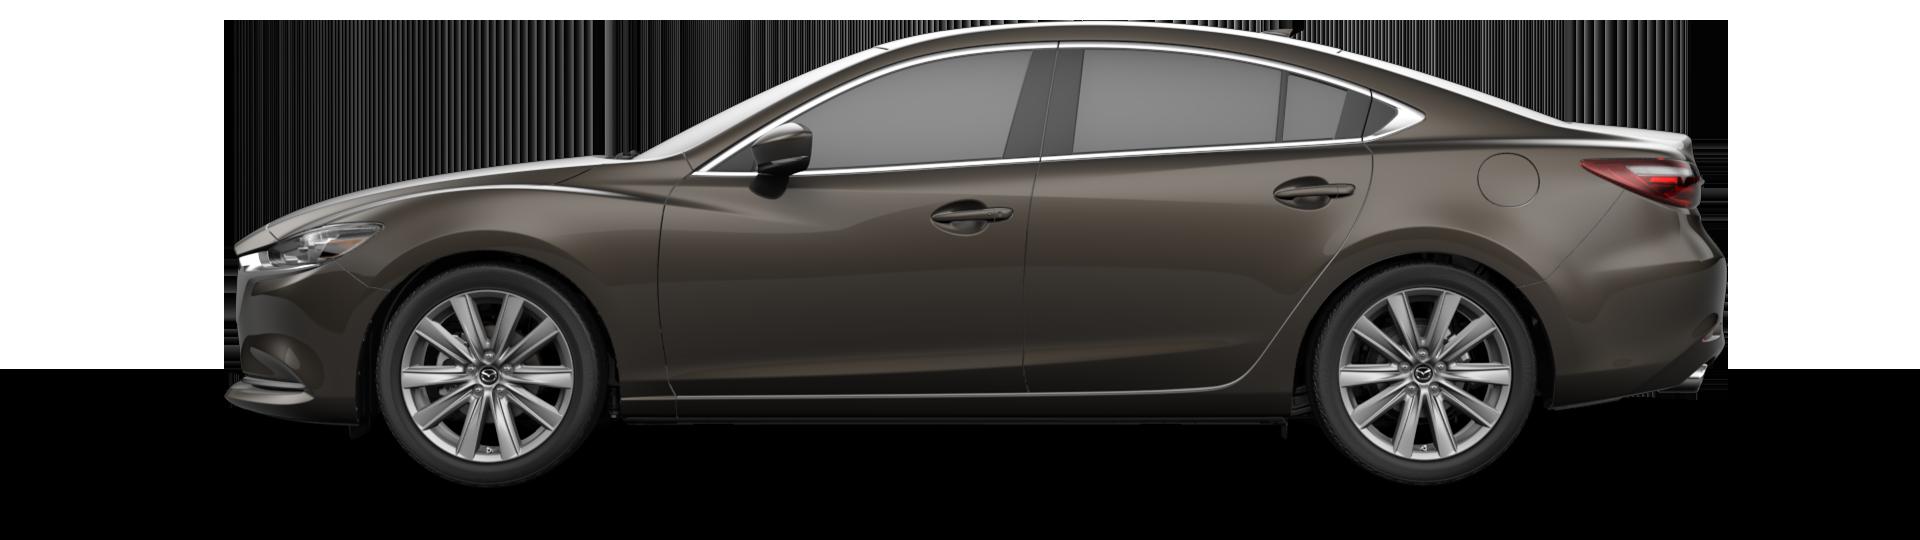 2018 Mazda Mazda6 Sedan Touring